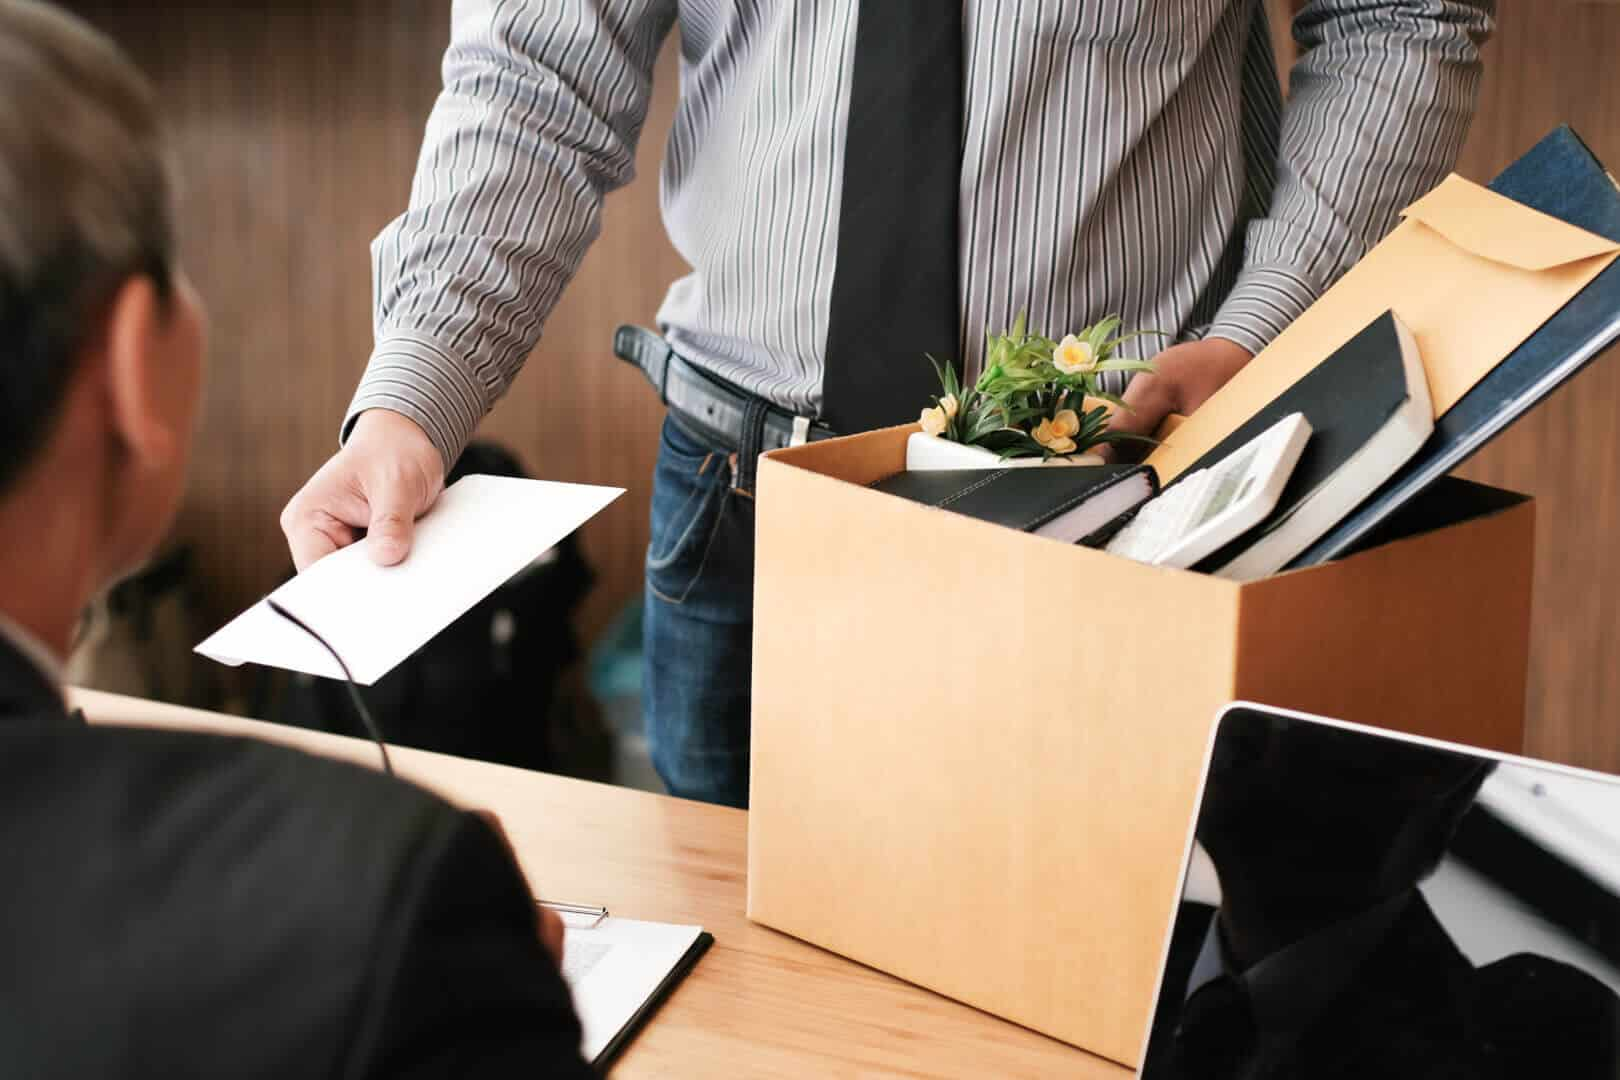 Employee Resigns